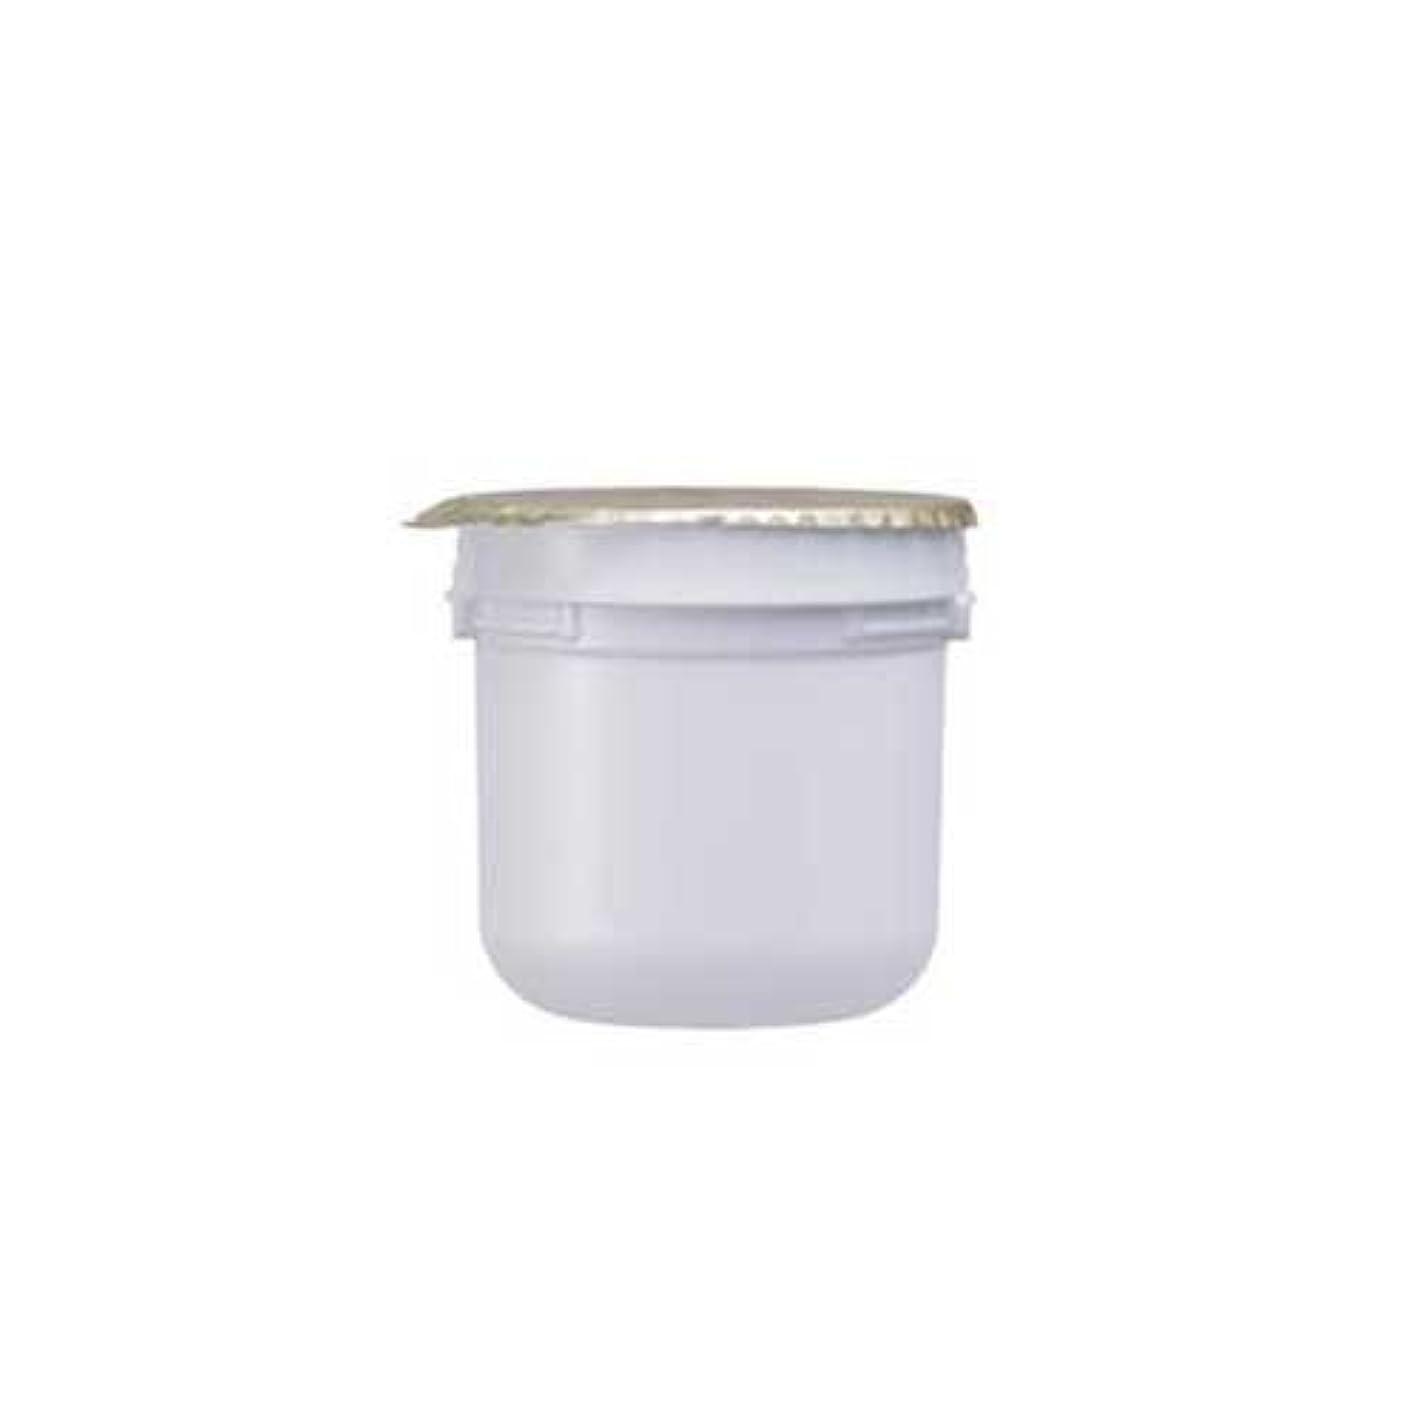 ASTALIFT(アスタリフト) ホワイト クリーム(美白クリーム)レフィル 30g